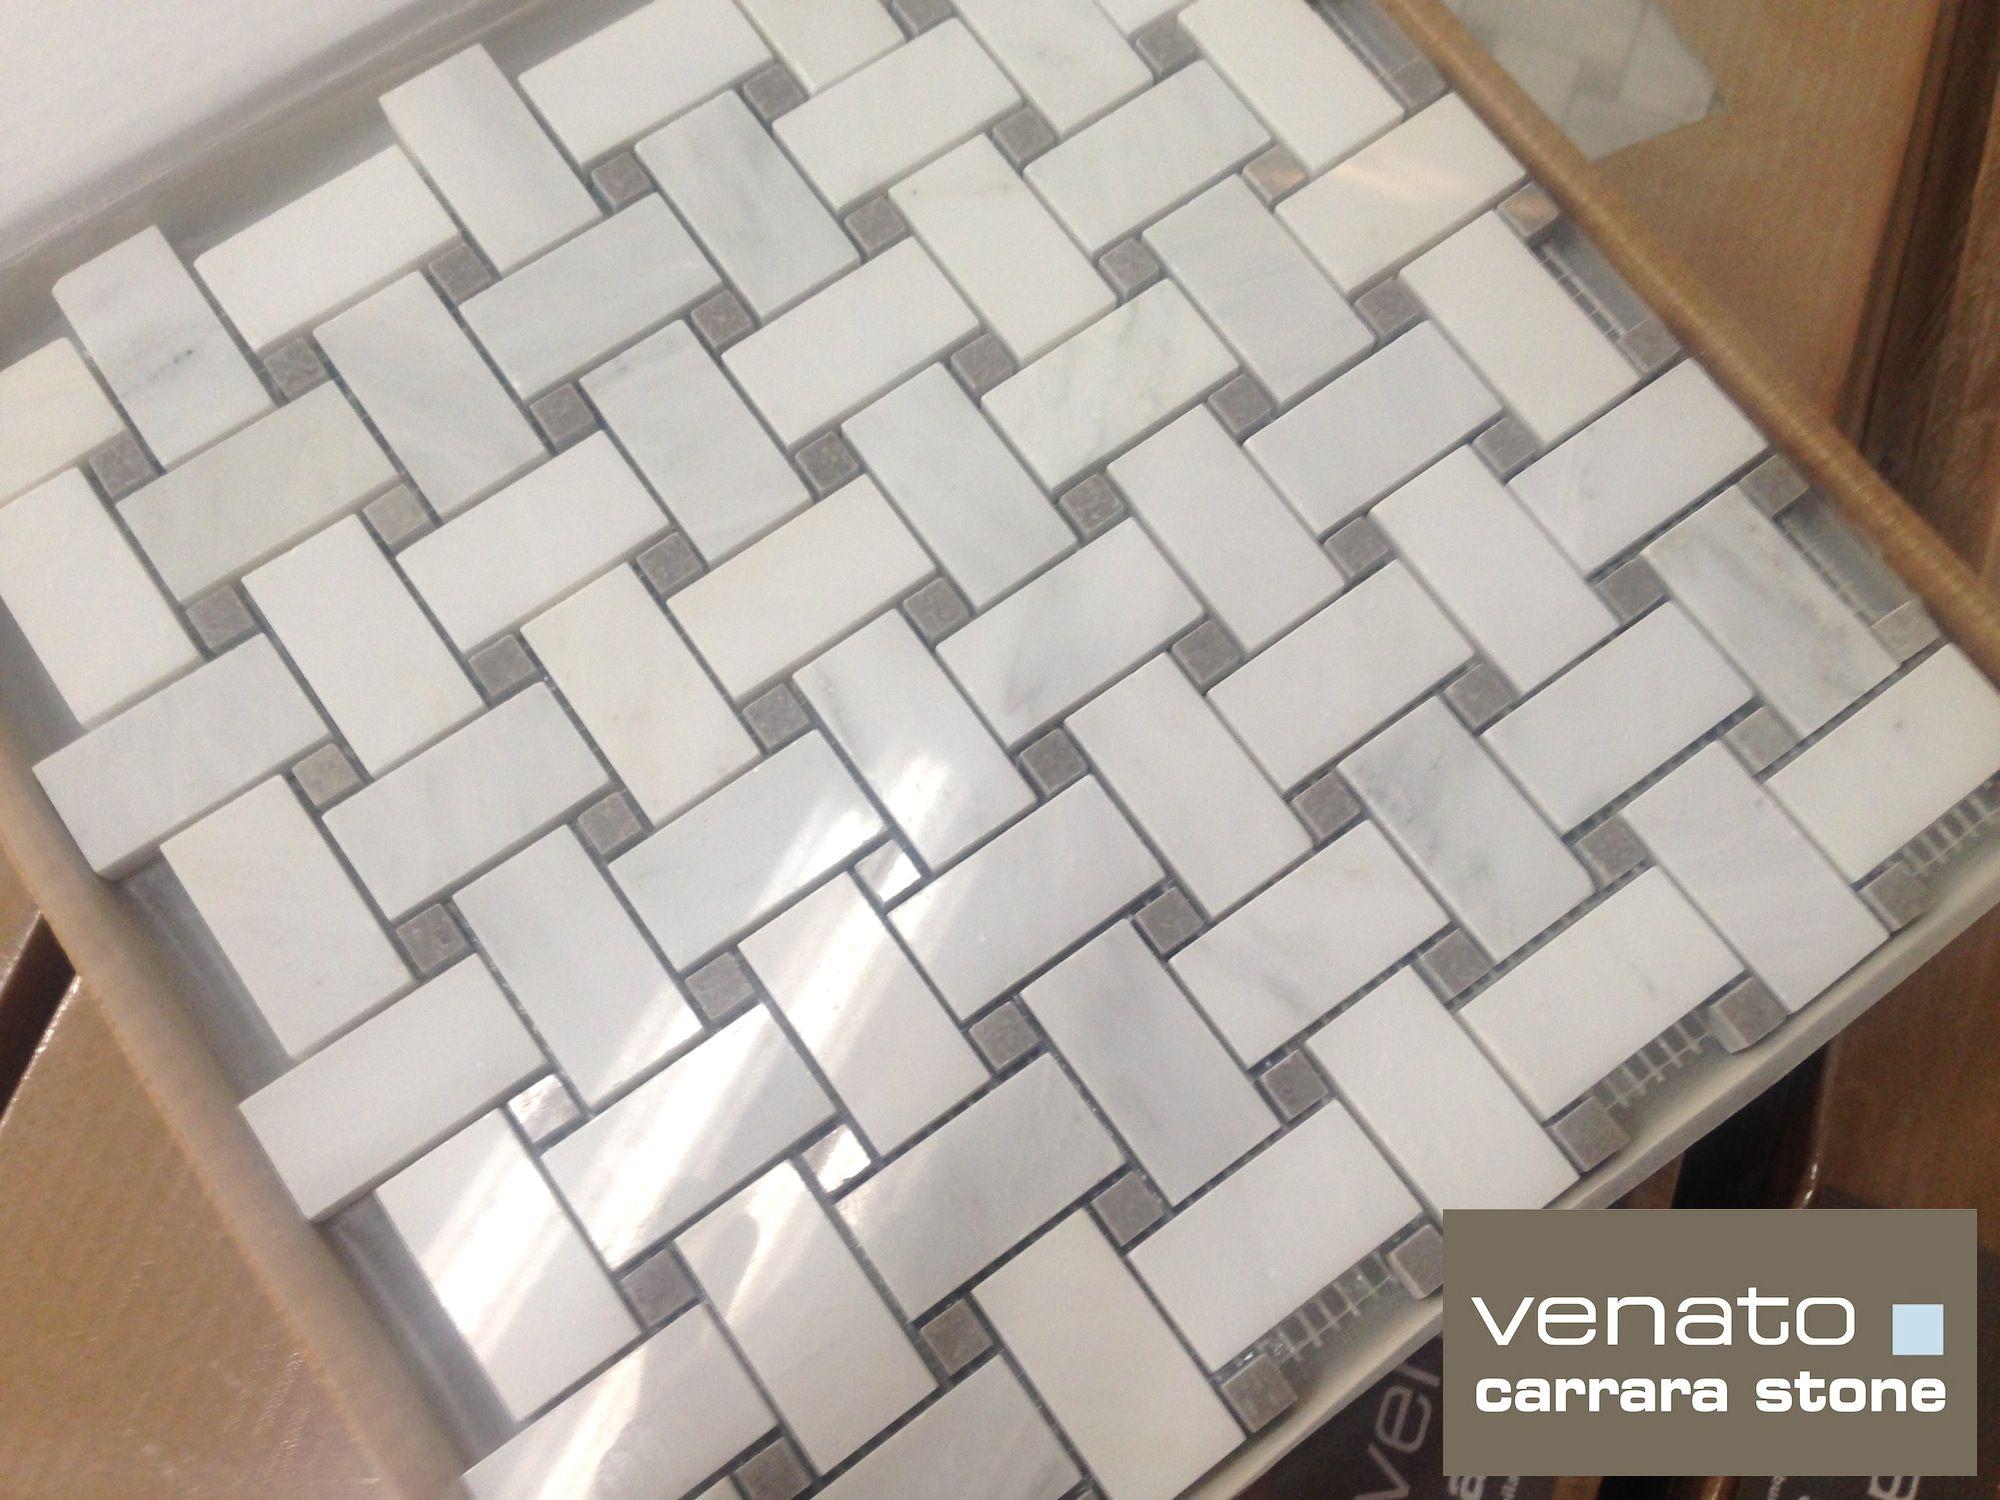 Stunning Basket Weave Tile For Classic Bathroom Design: Carrara ...